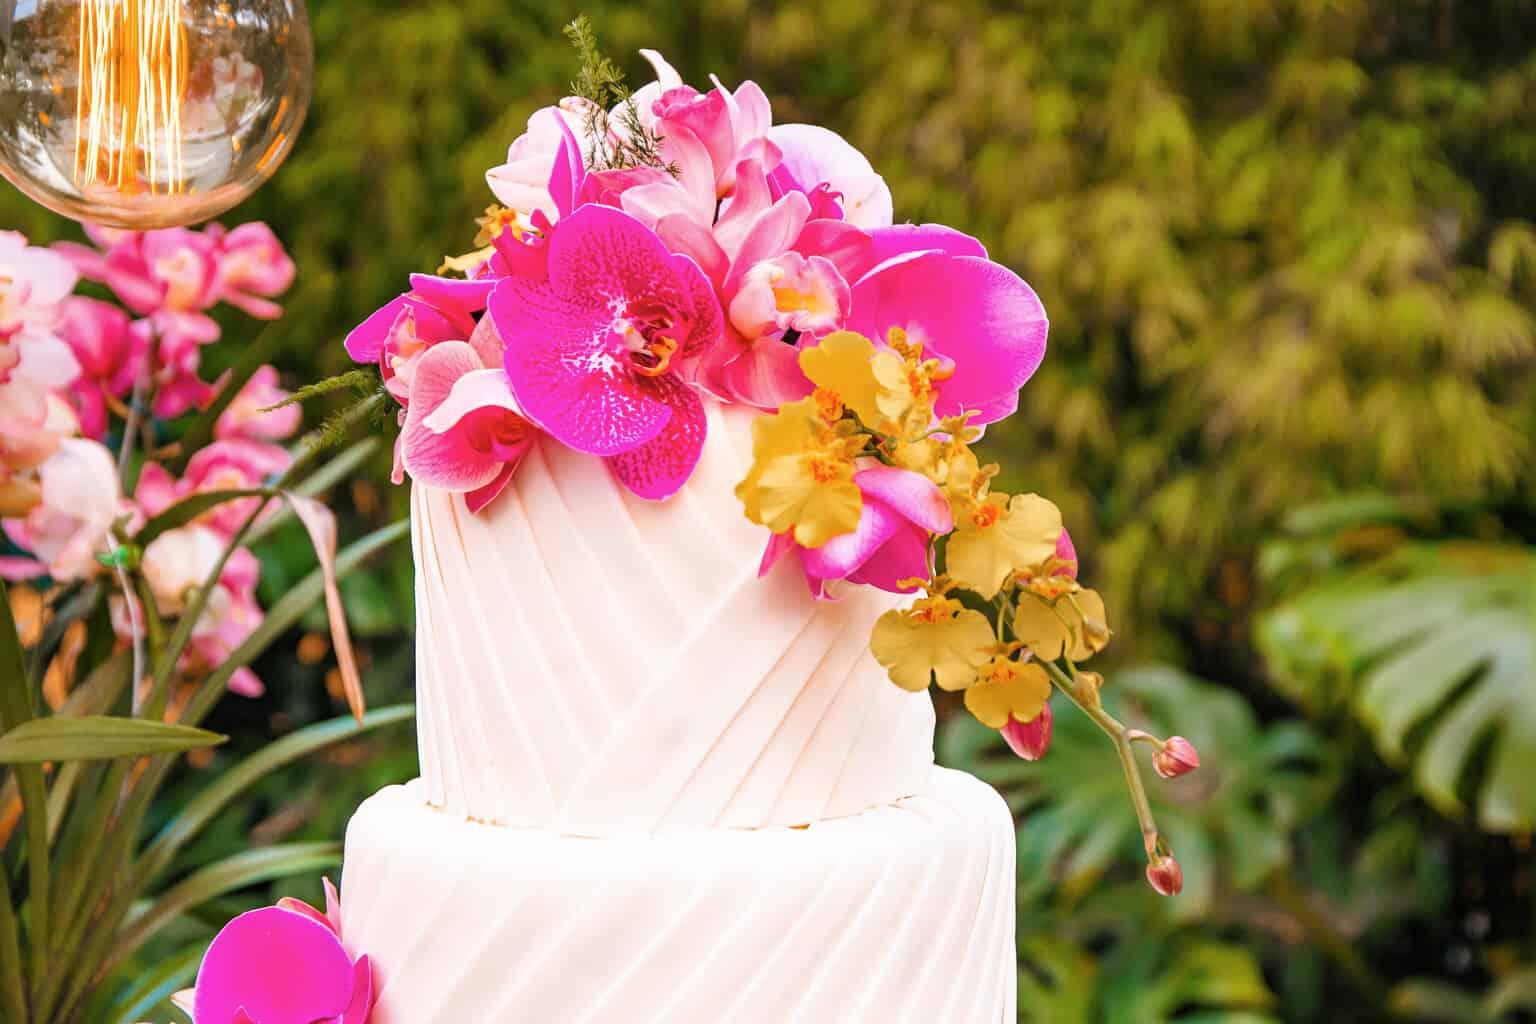 casamento-Beatriz-e-Joao-Fernando-decoracao-colorida-Itaipava-Locanda-Della-Mimosa-Thienny-Tammis75